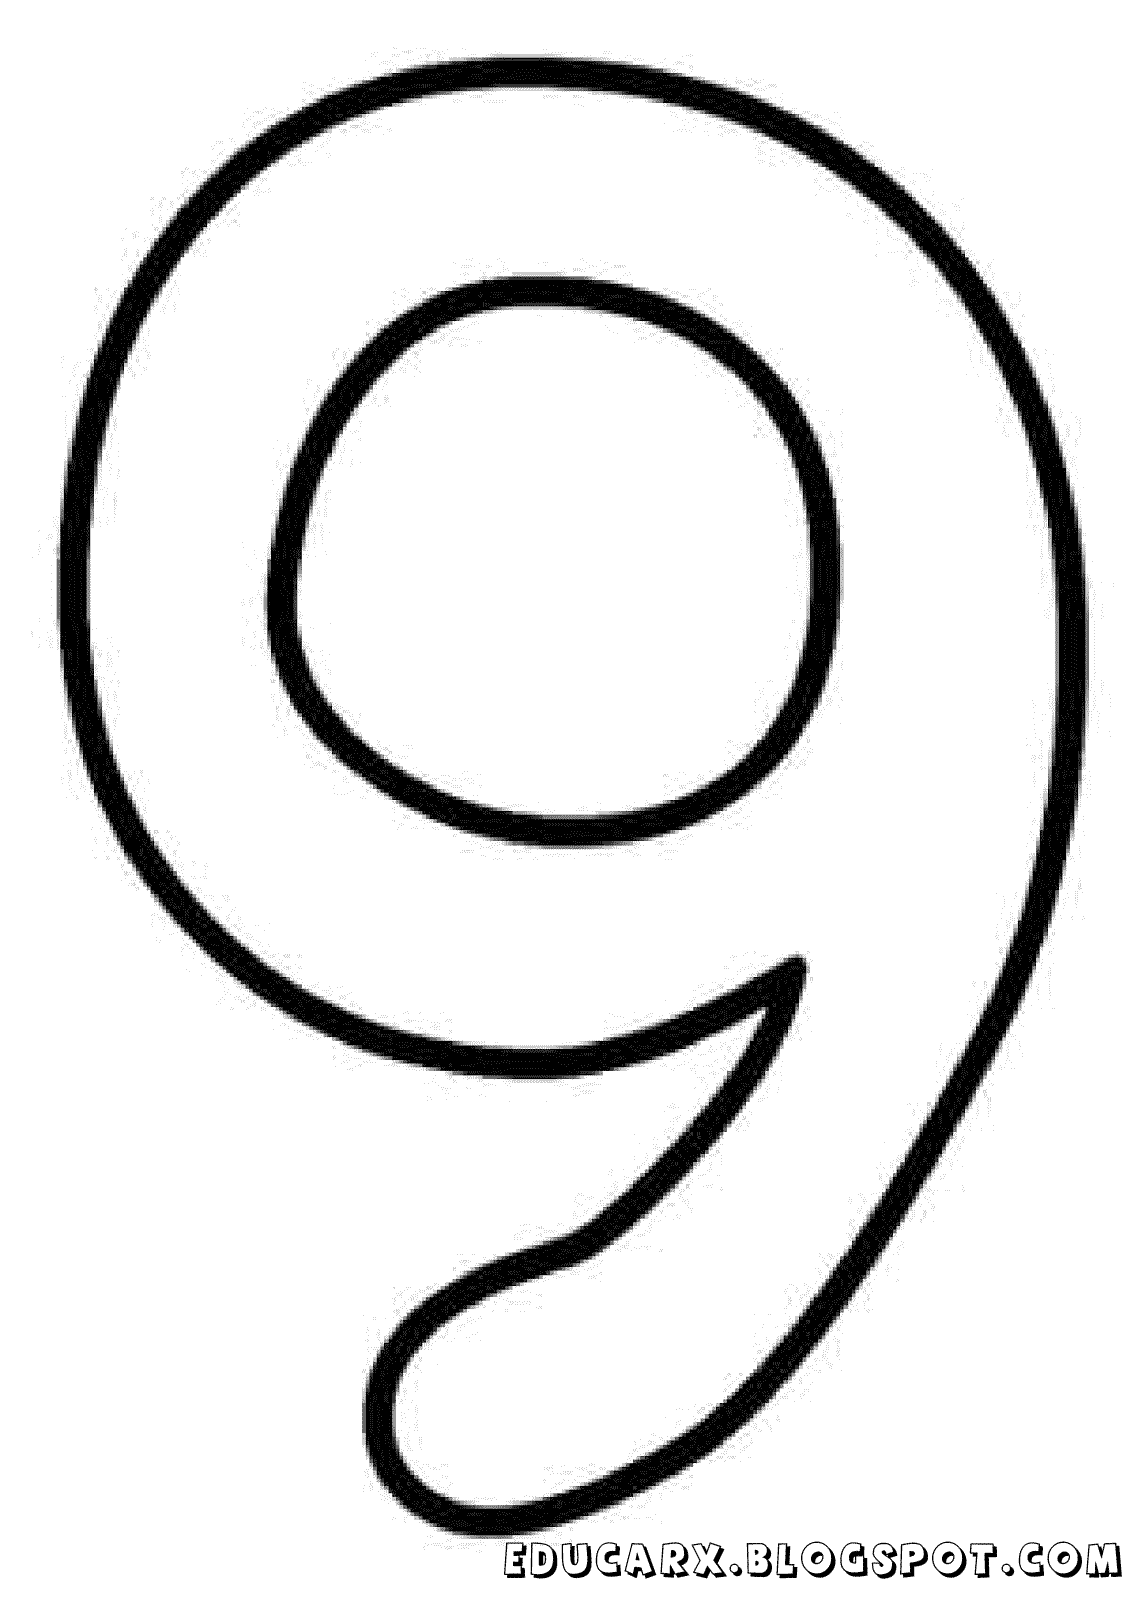 30 cm de pica na morena - 3 10